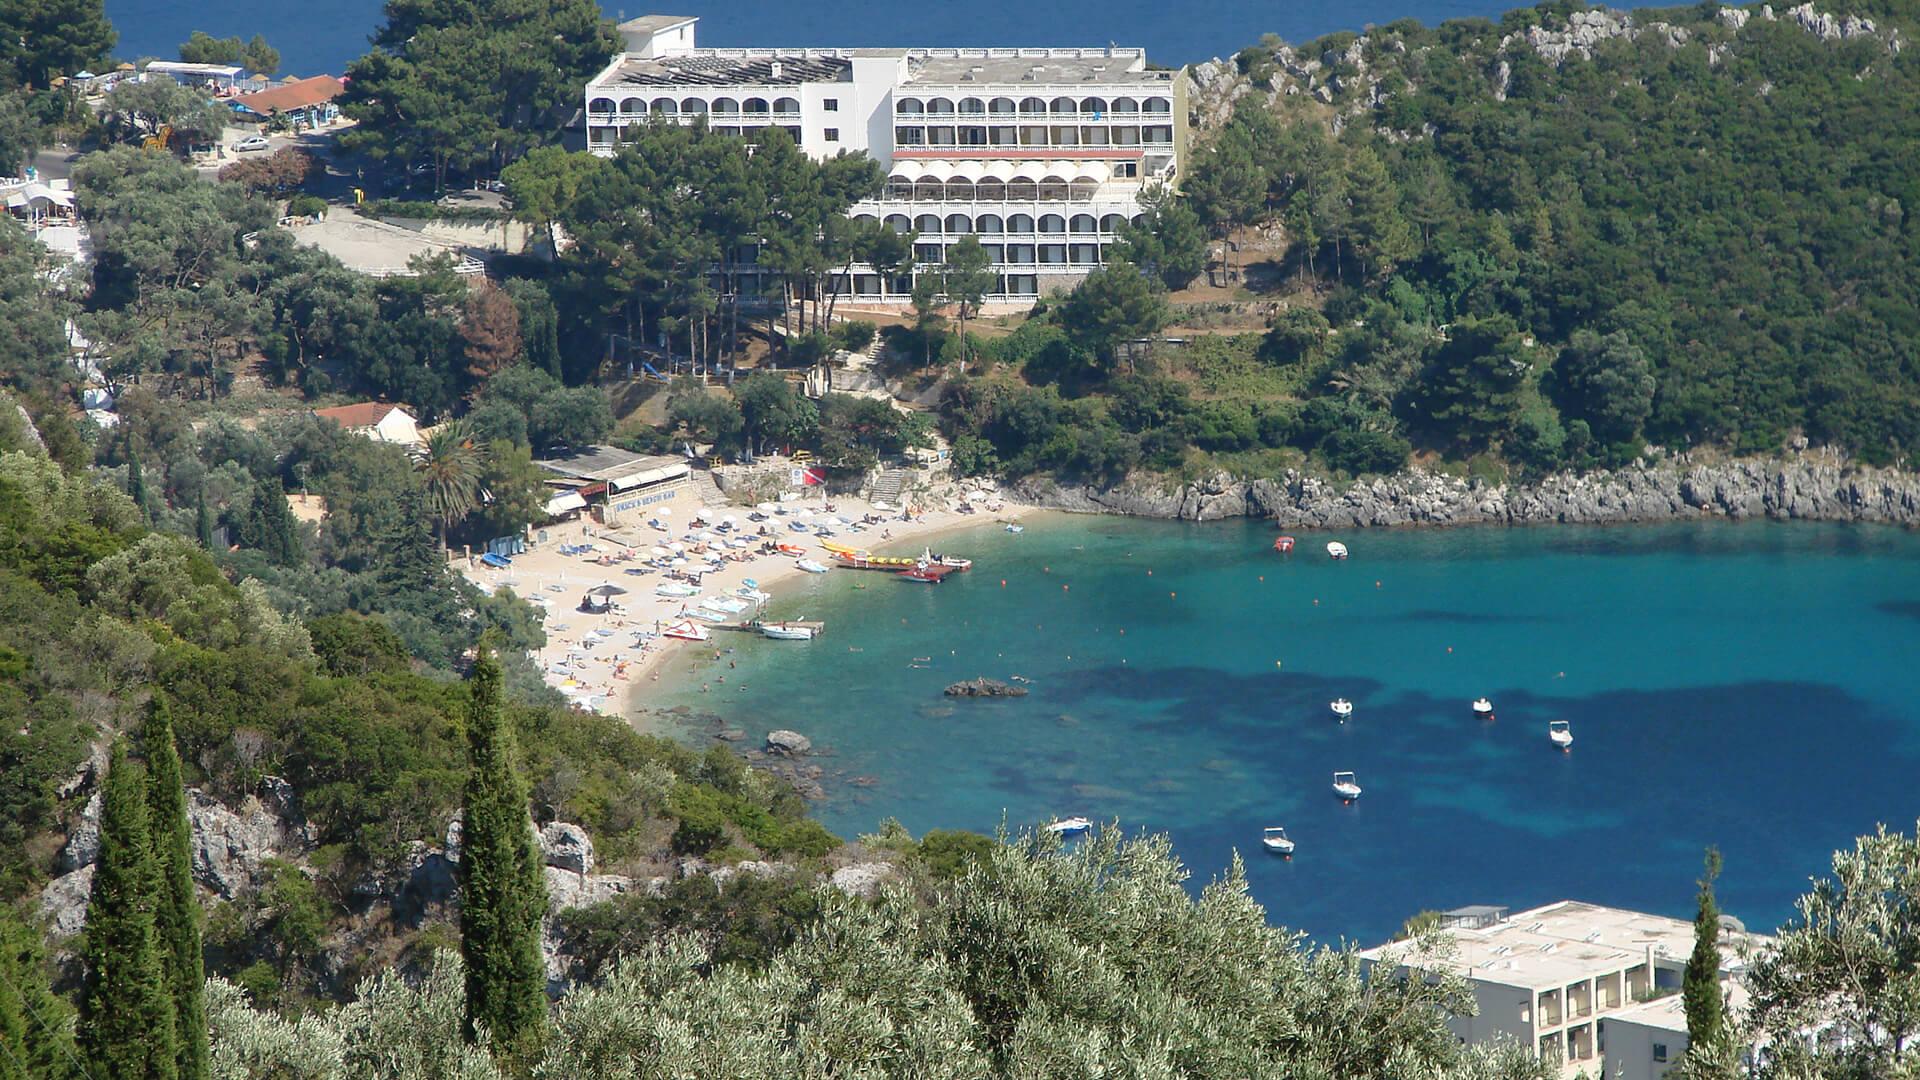 Agia Triada Beach - Paleokastritsa, Corfu